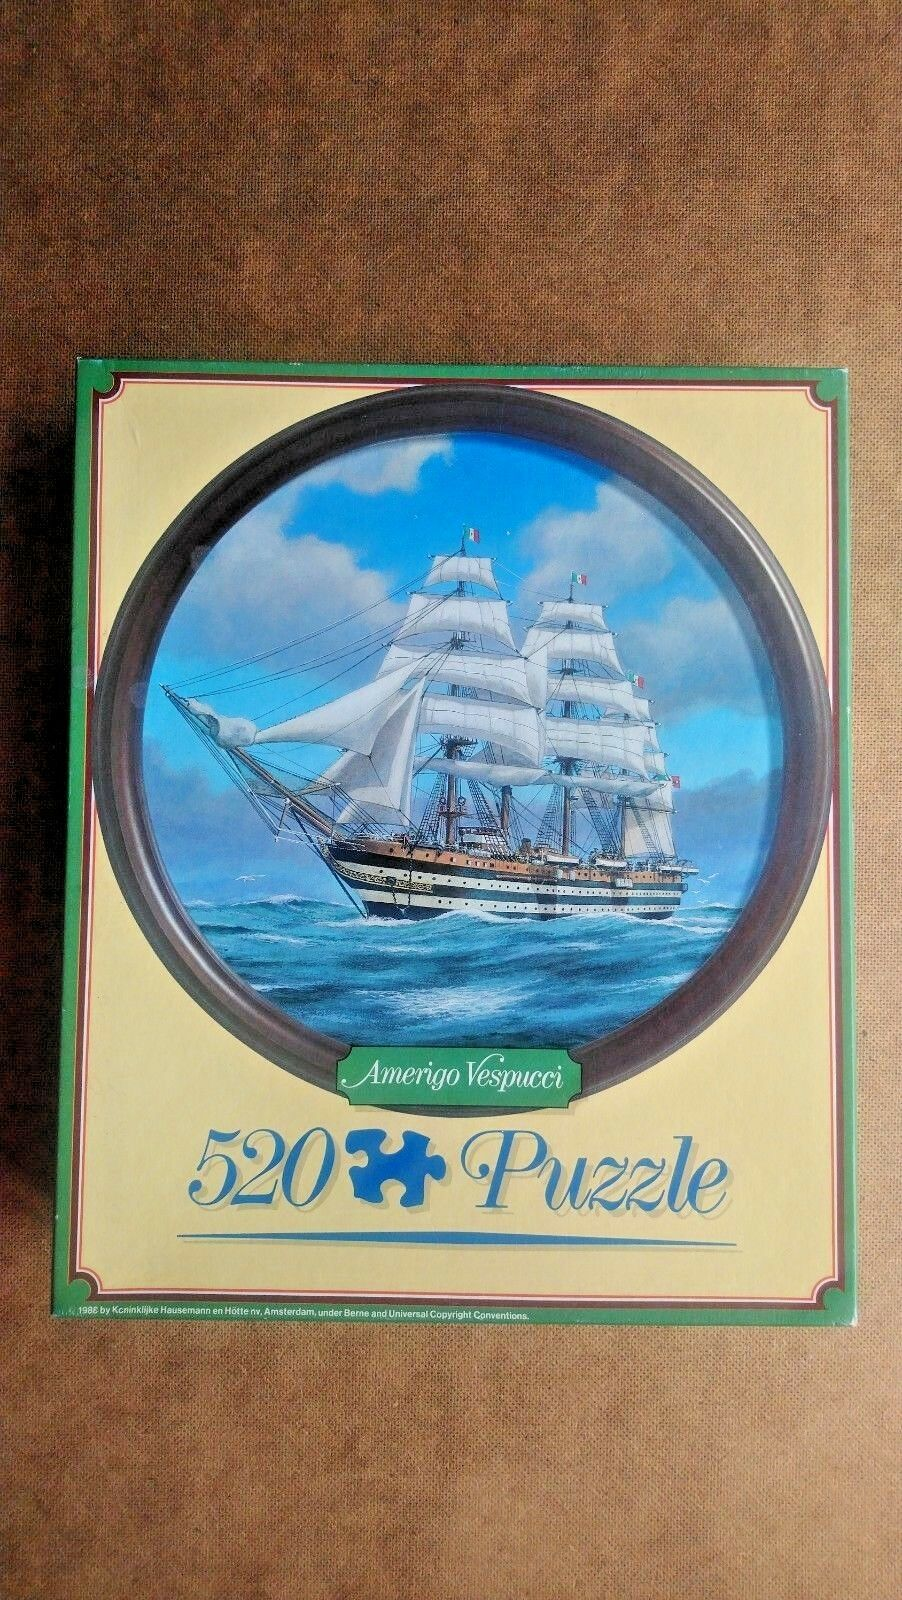 Amerigo Vespucci 520 Piece Circular Jigsaw by Jumbo 1986